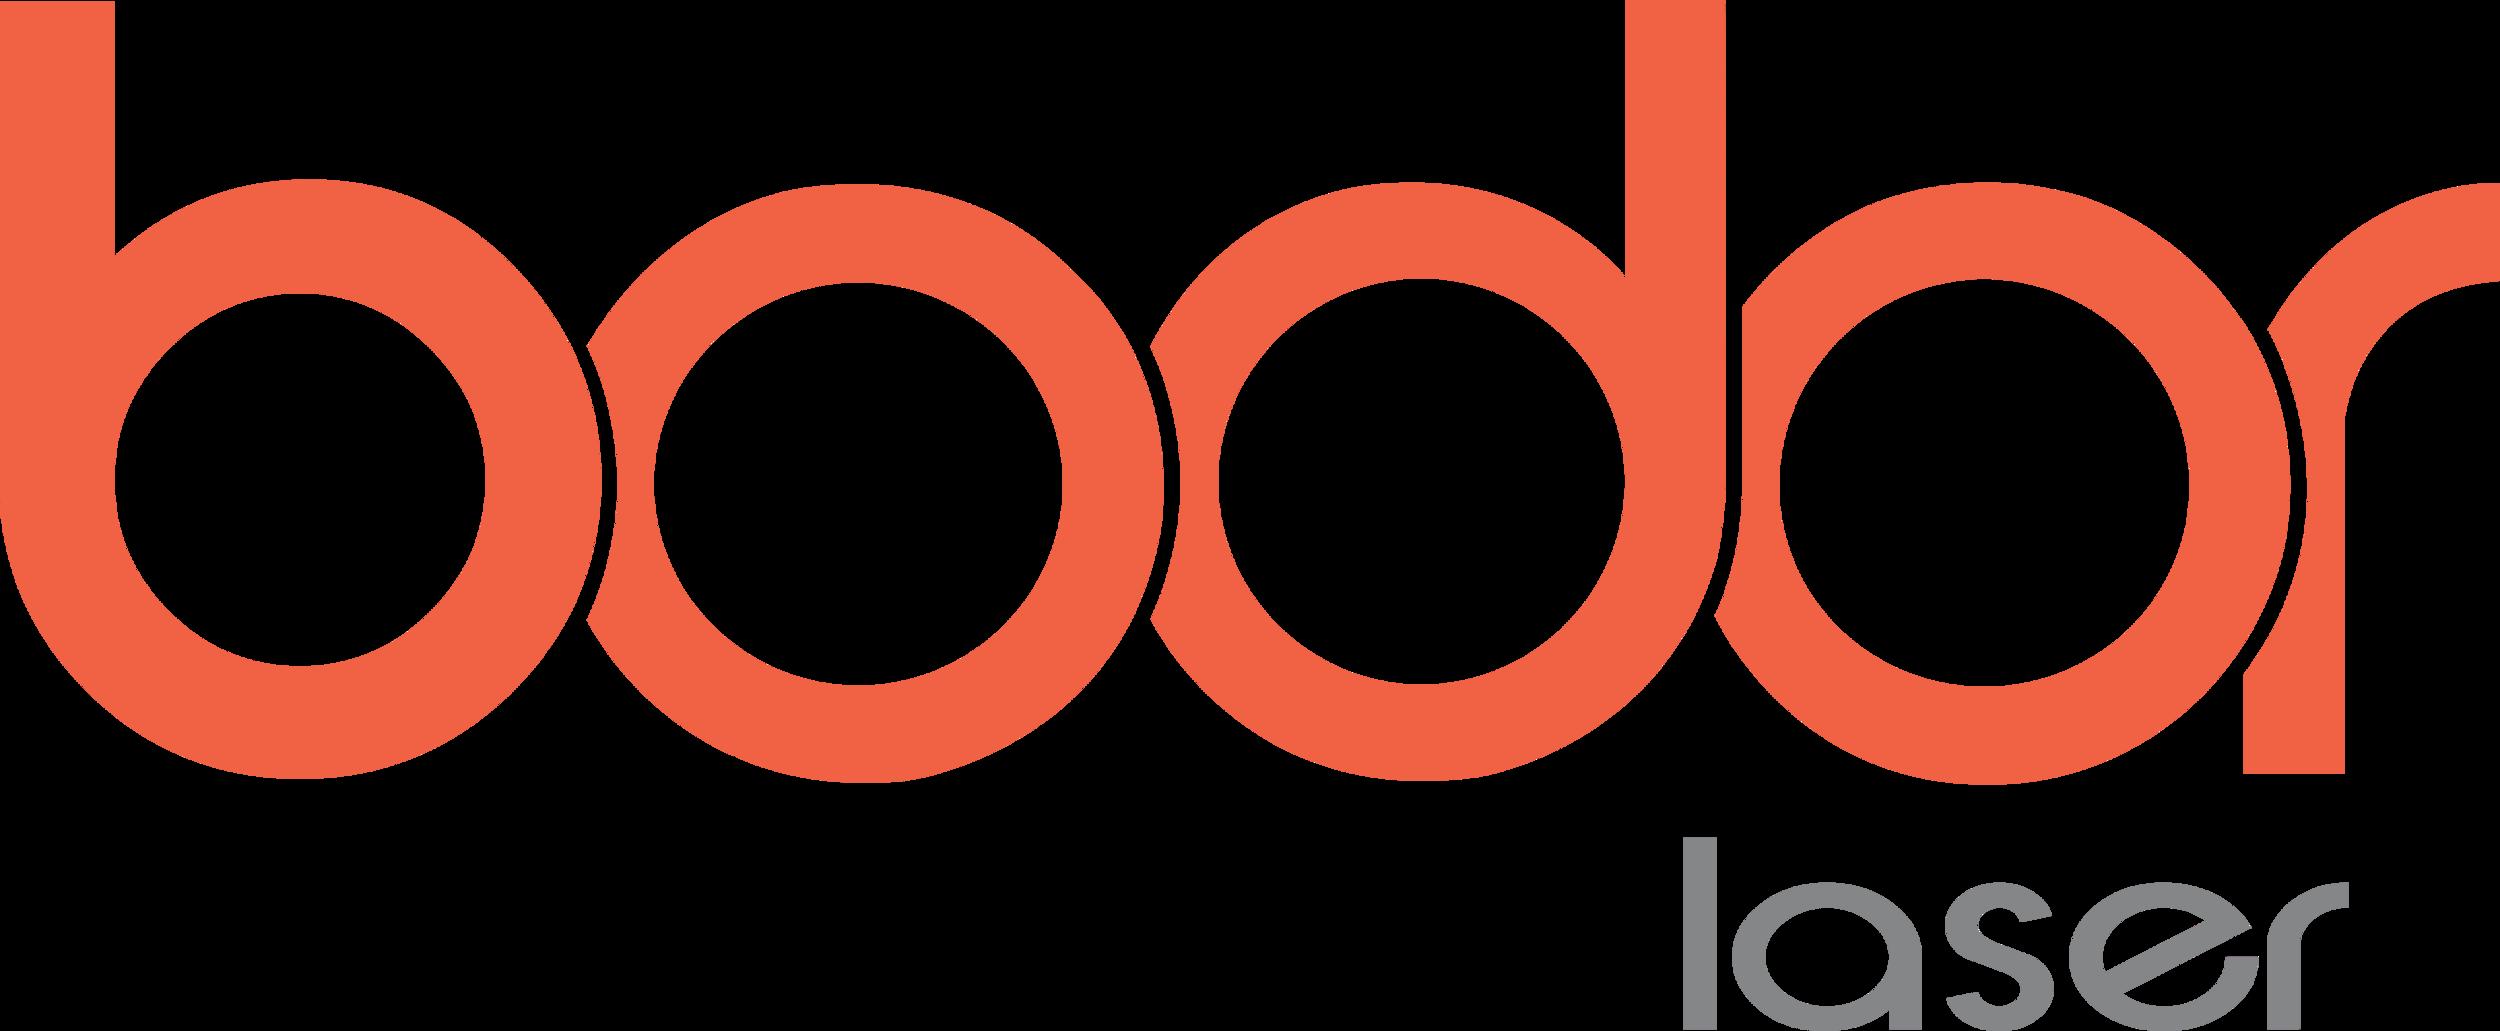 Bodor.png